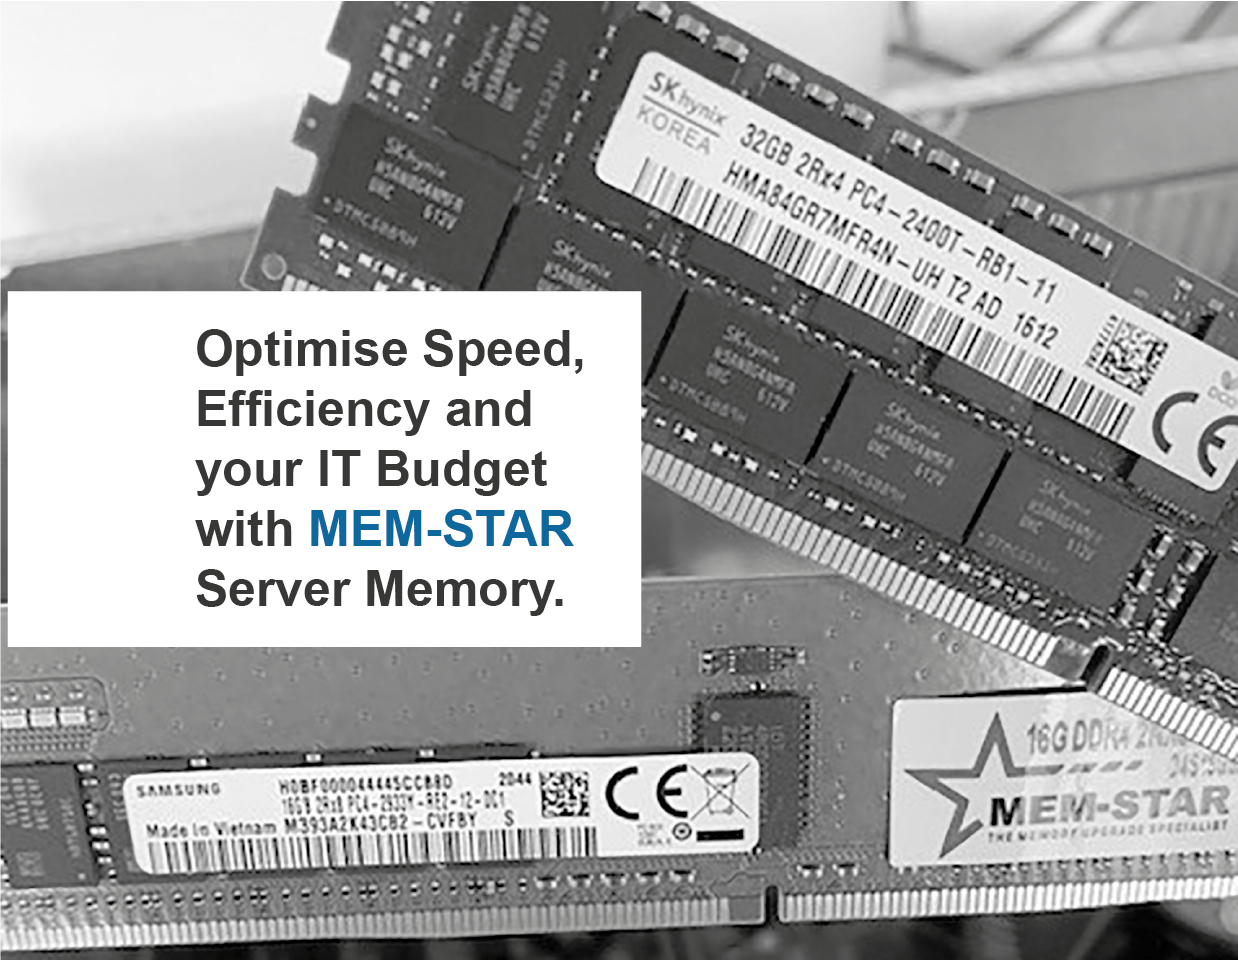 Optimise Speed & Efficiency with Mem-Star Server Memory